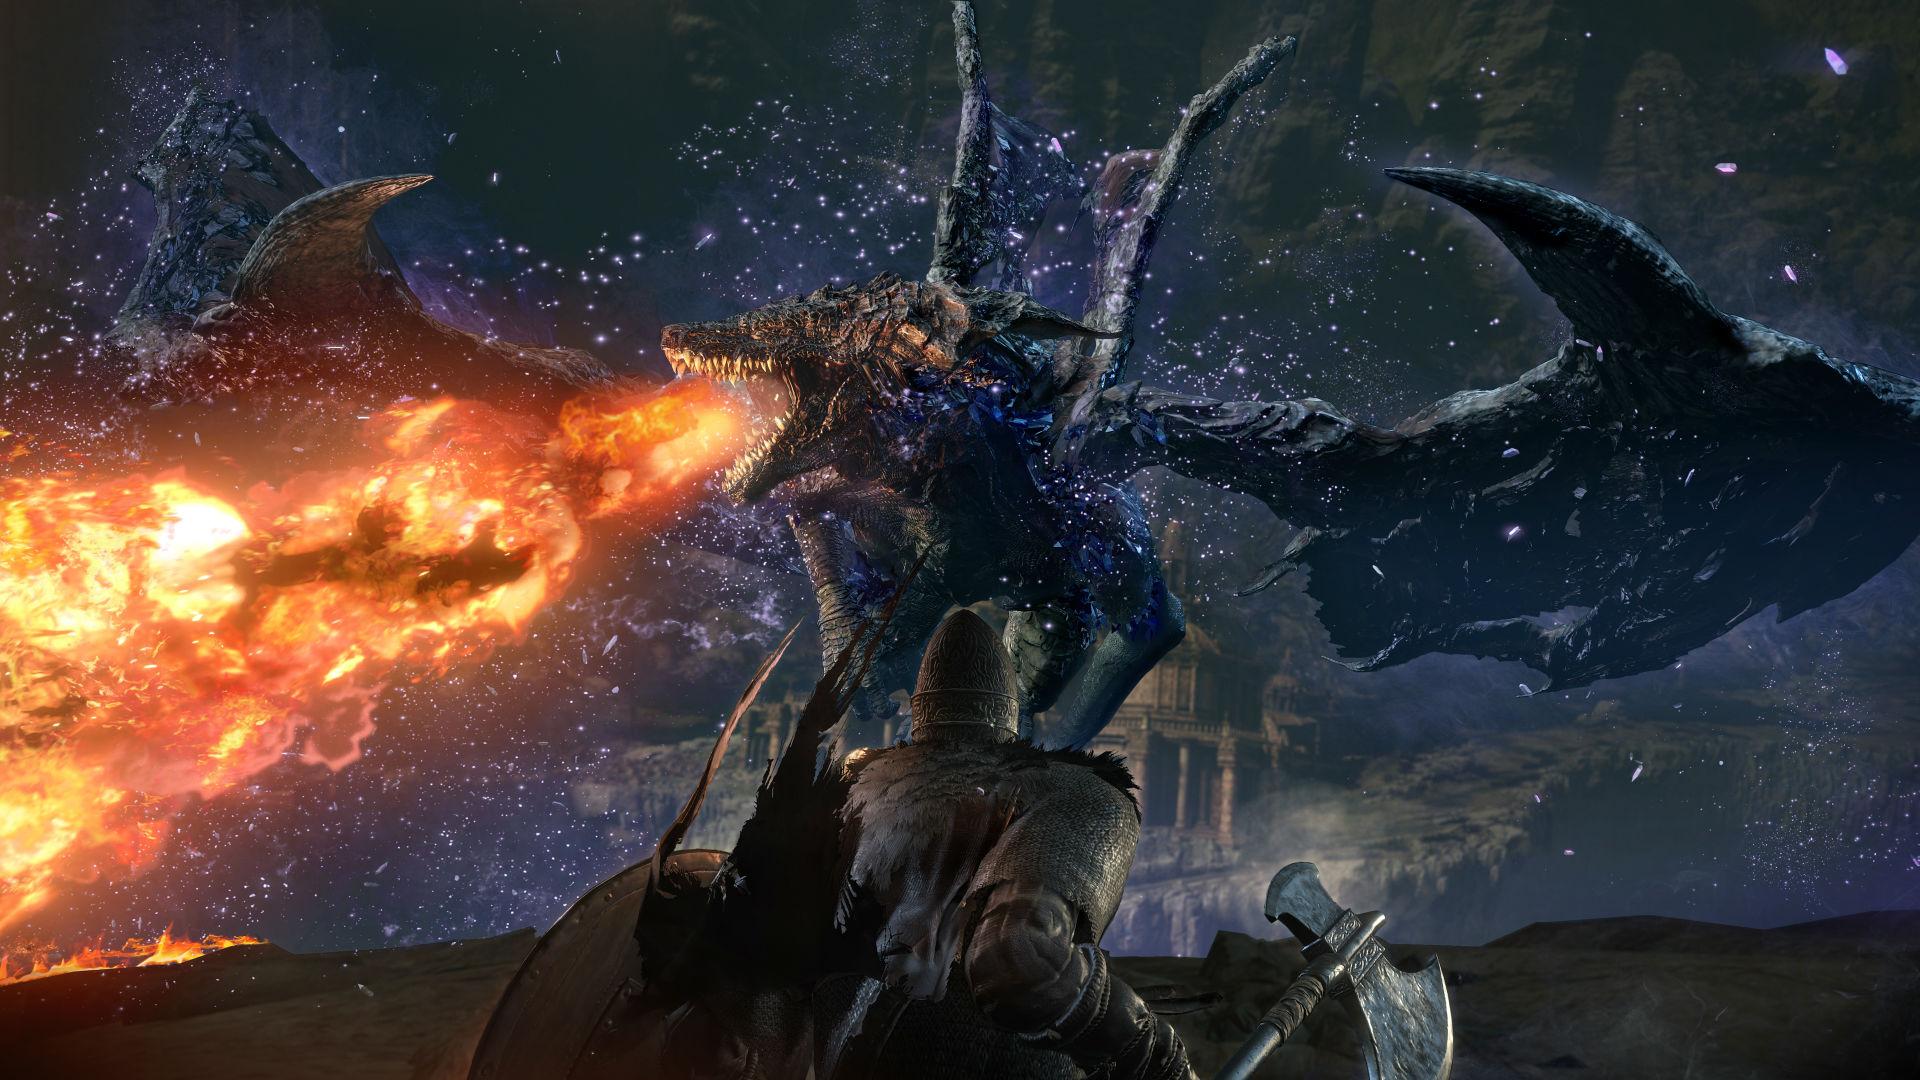 Dark Souls III The Ringed City Gets Darkly Gorgeous Screenshots